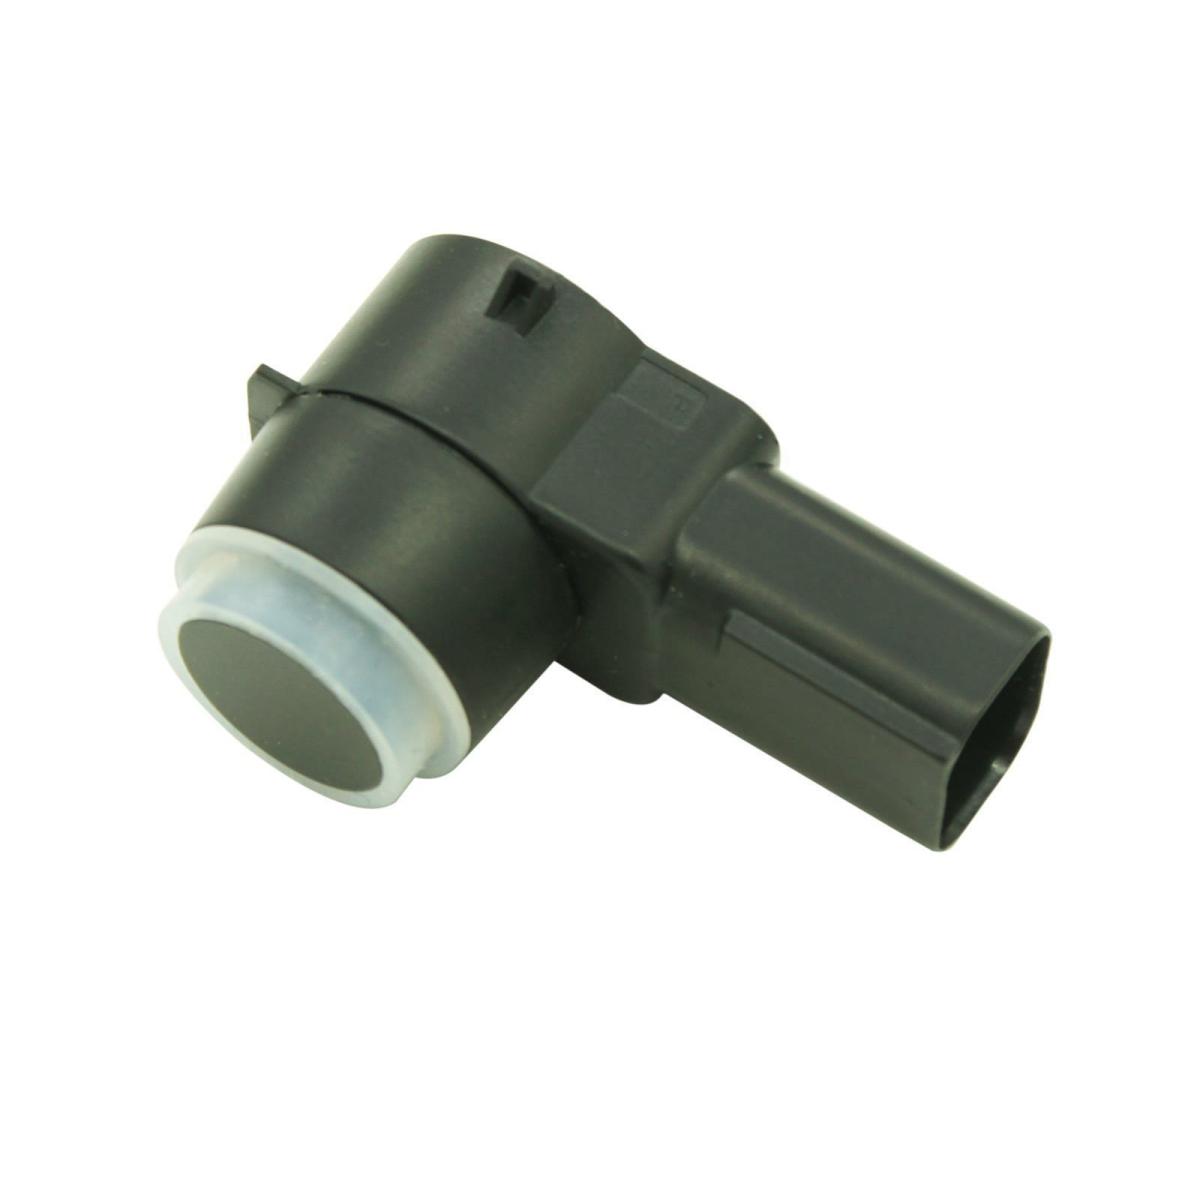 Park sensor 8R29-15K859-AAW for Ford PDC Parktronic